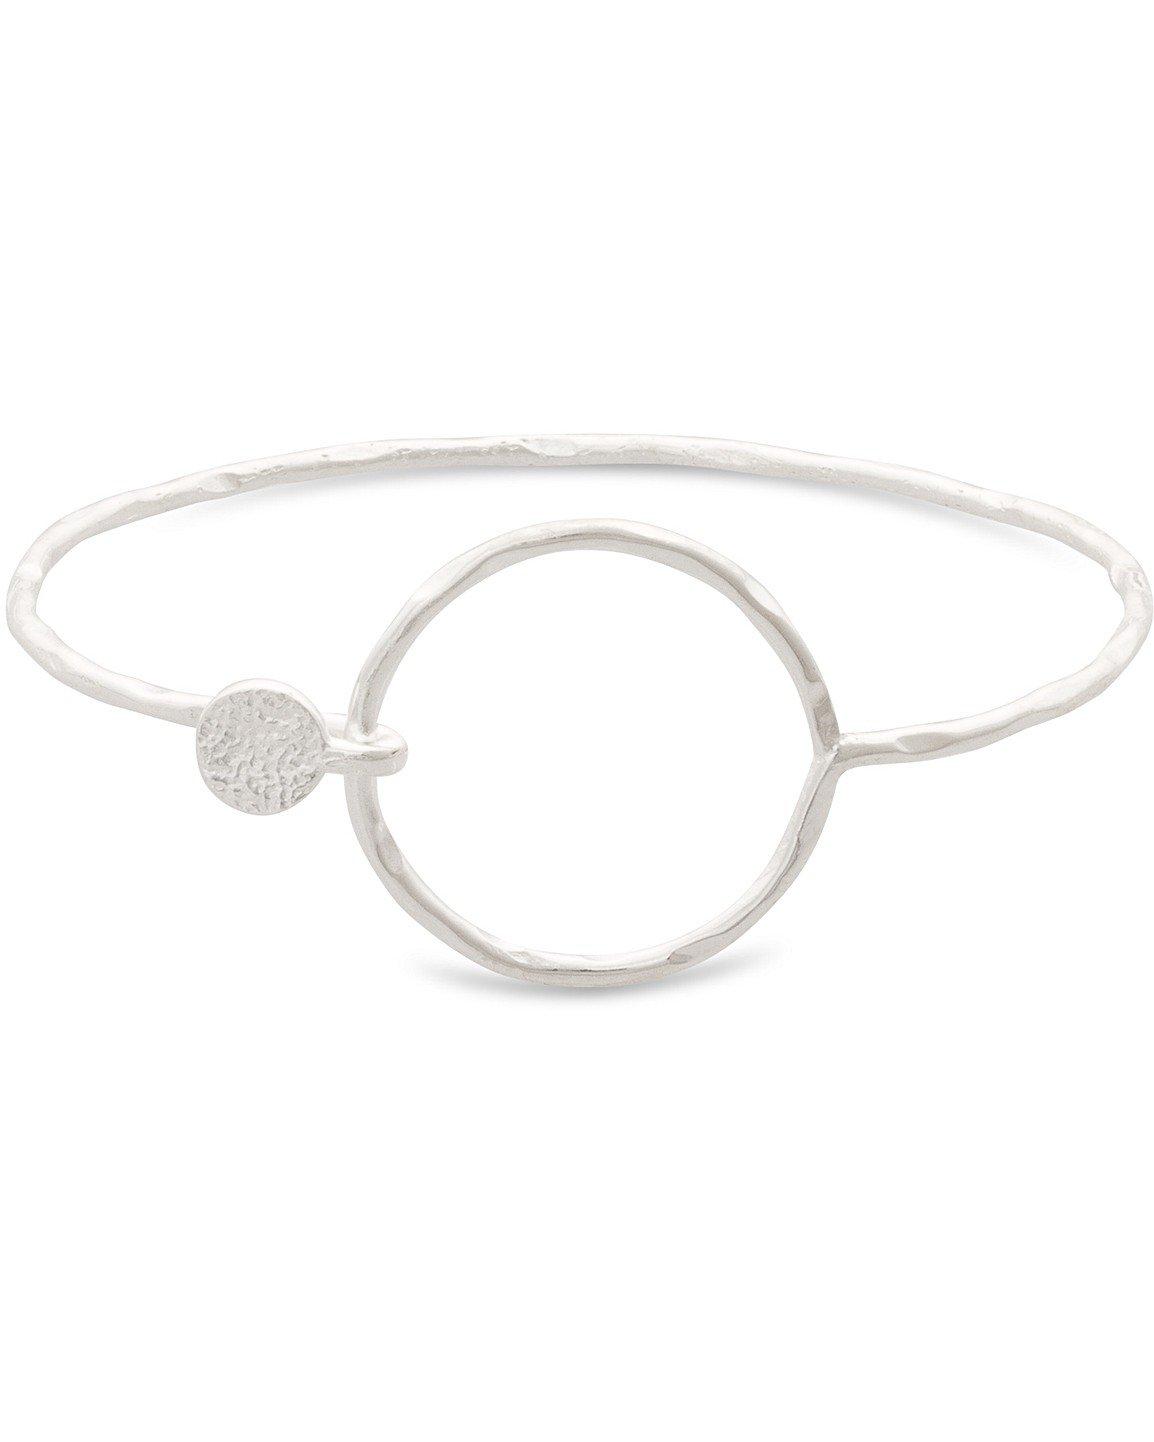 fe8e03e1d24 Bangles & Bracelets - Silver Bangles | Oliver Bonas